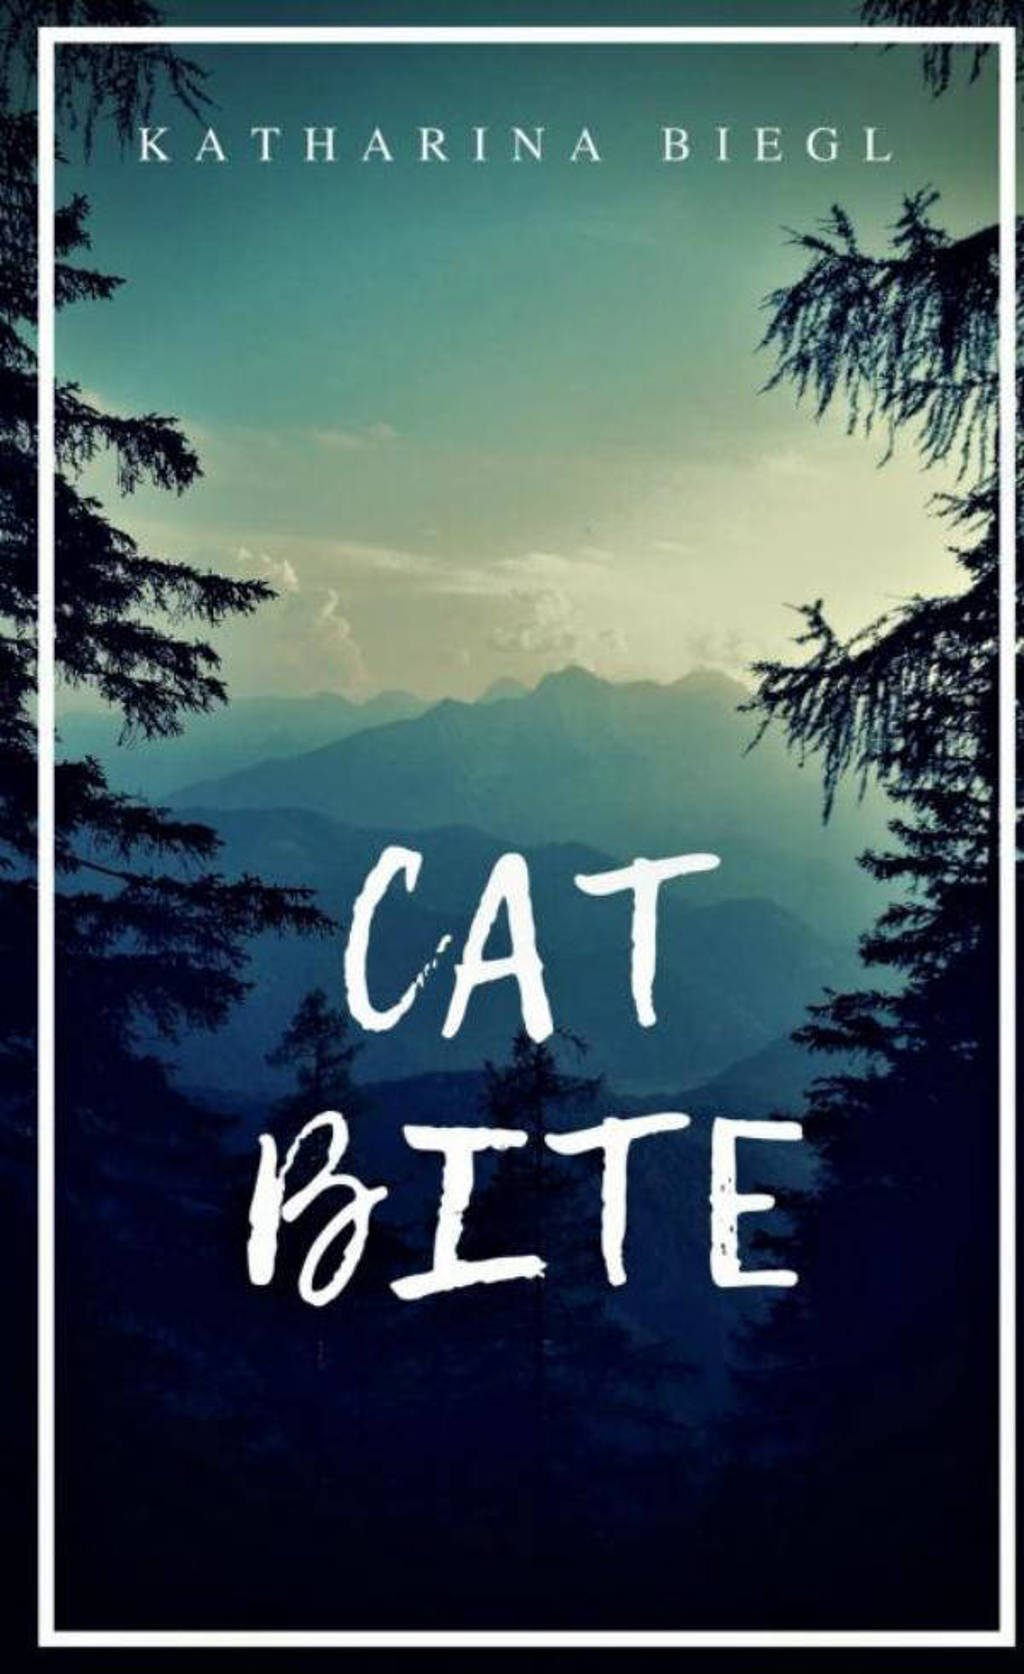 Catbite - Katharina Biegl